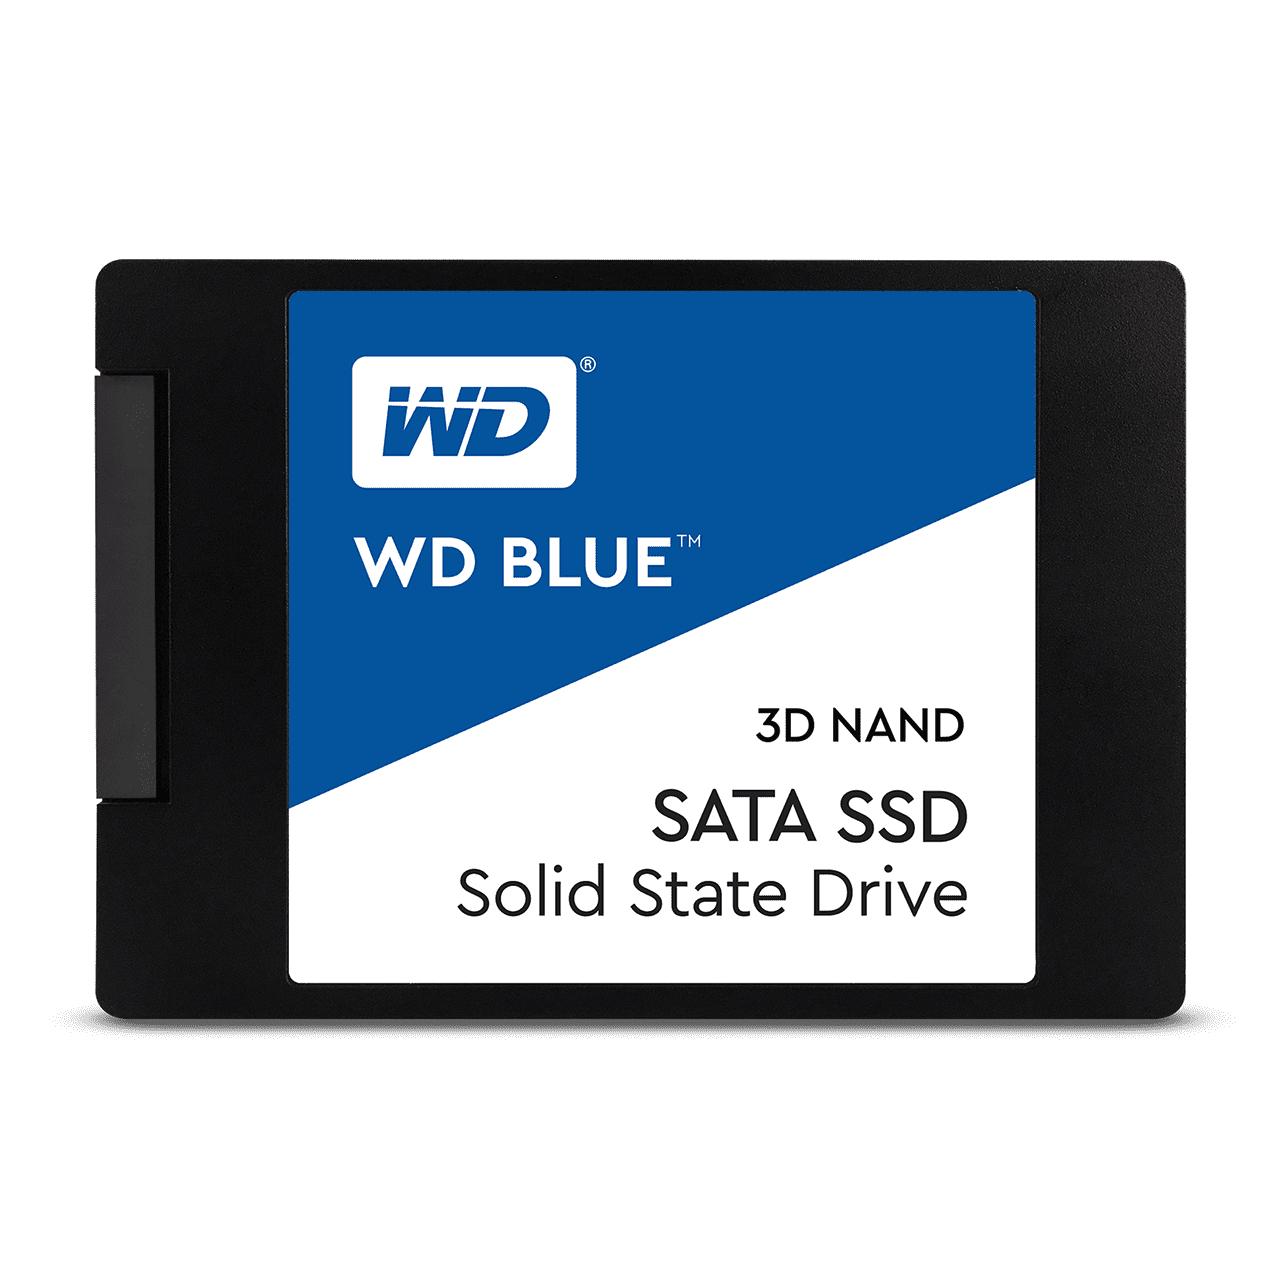 WD Blue 4Tb 3D NAND Internal SATA SSD - £338.48 @ ebay / ebuyer